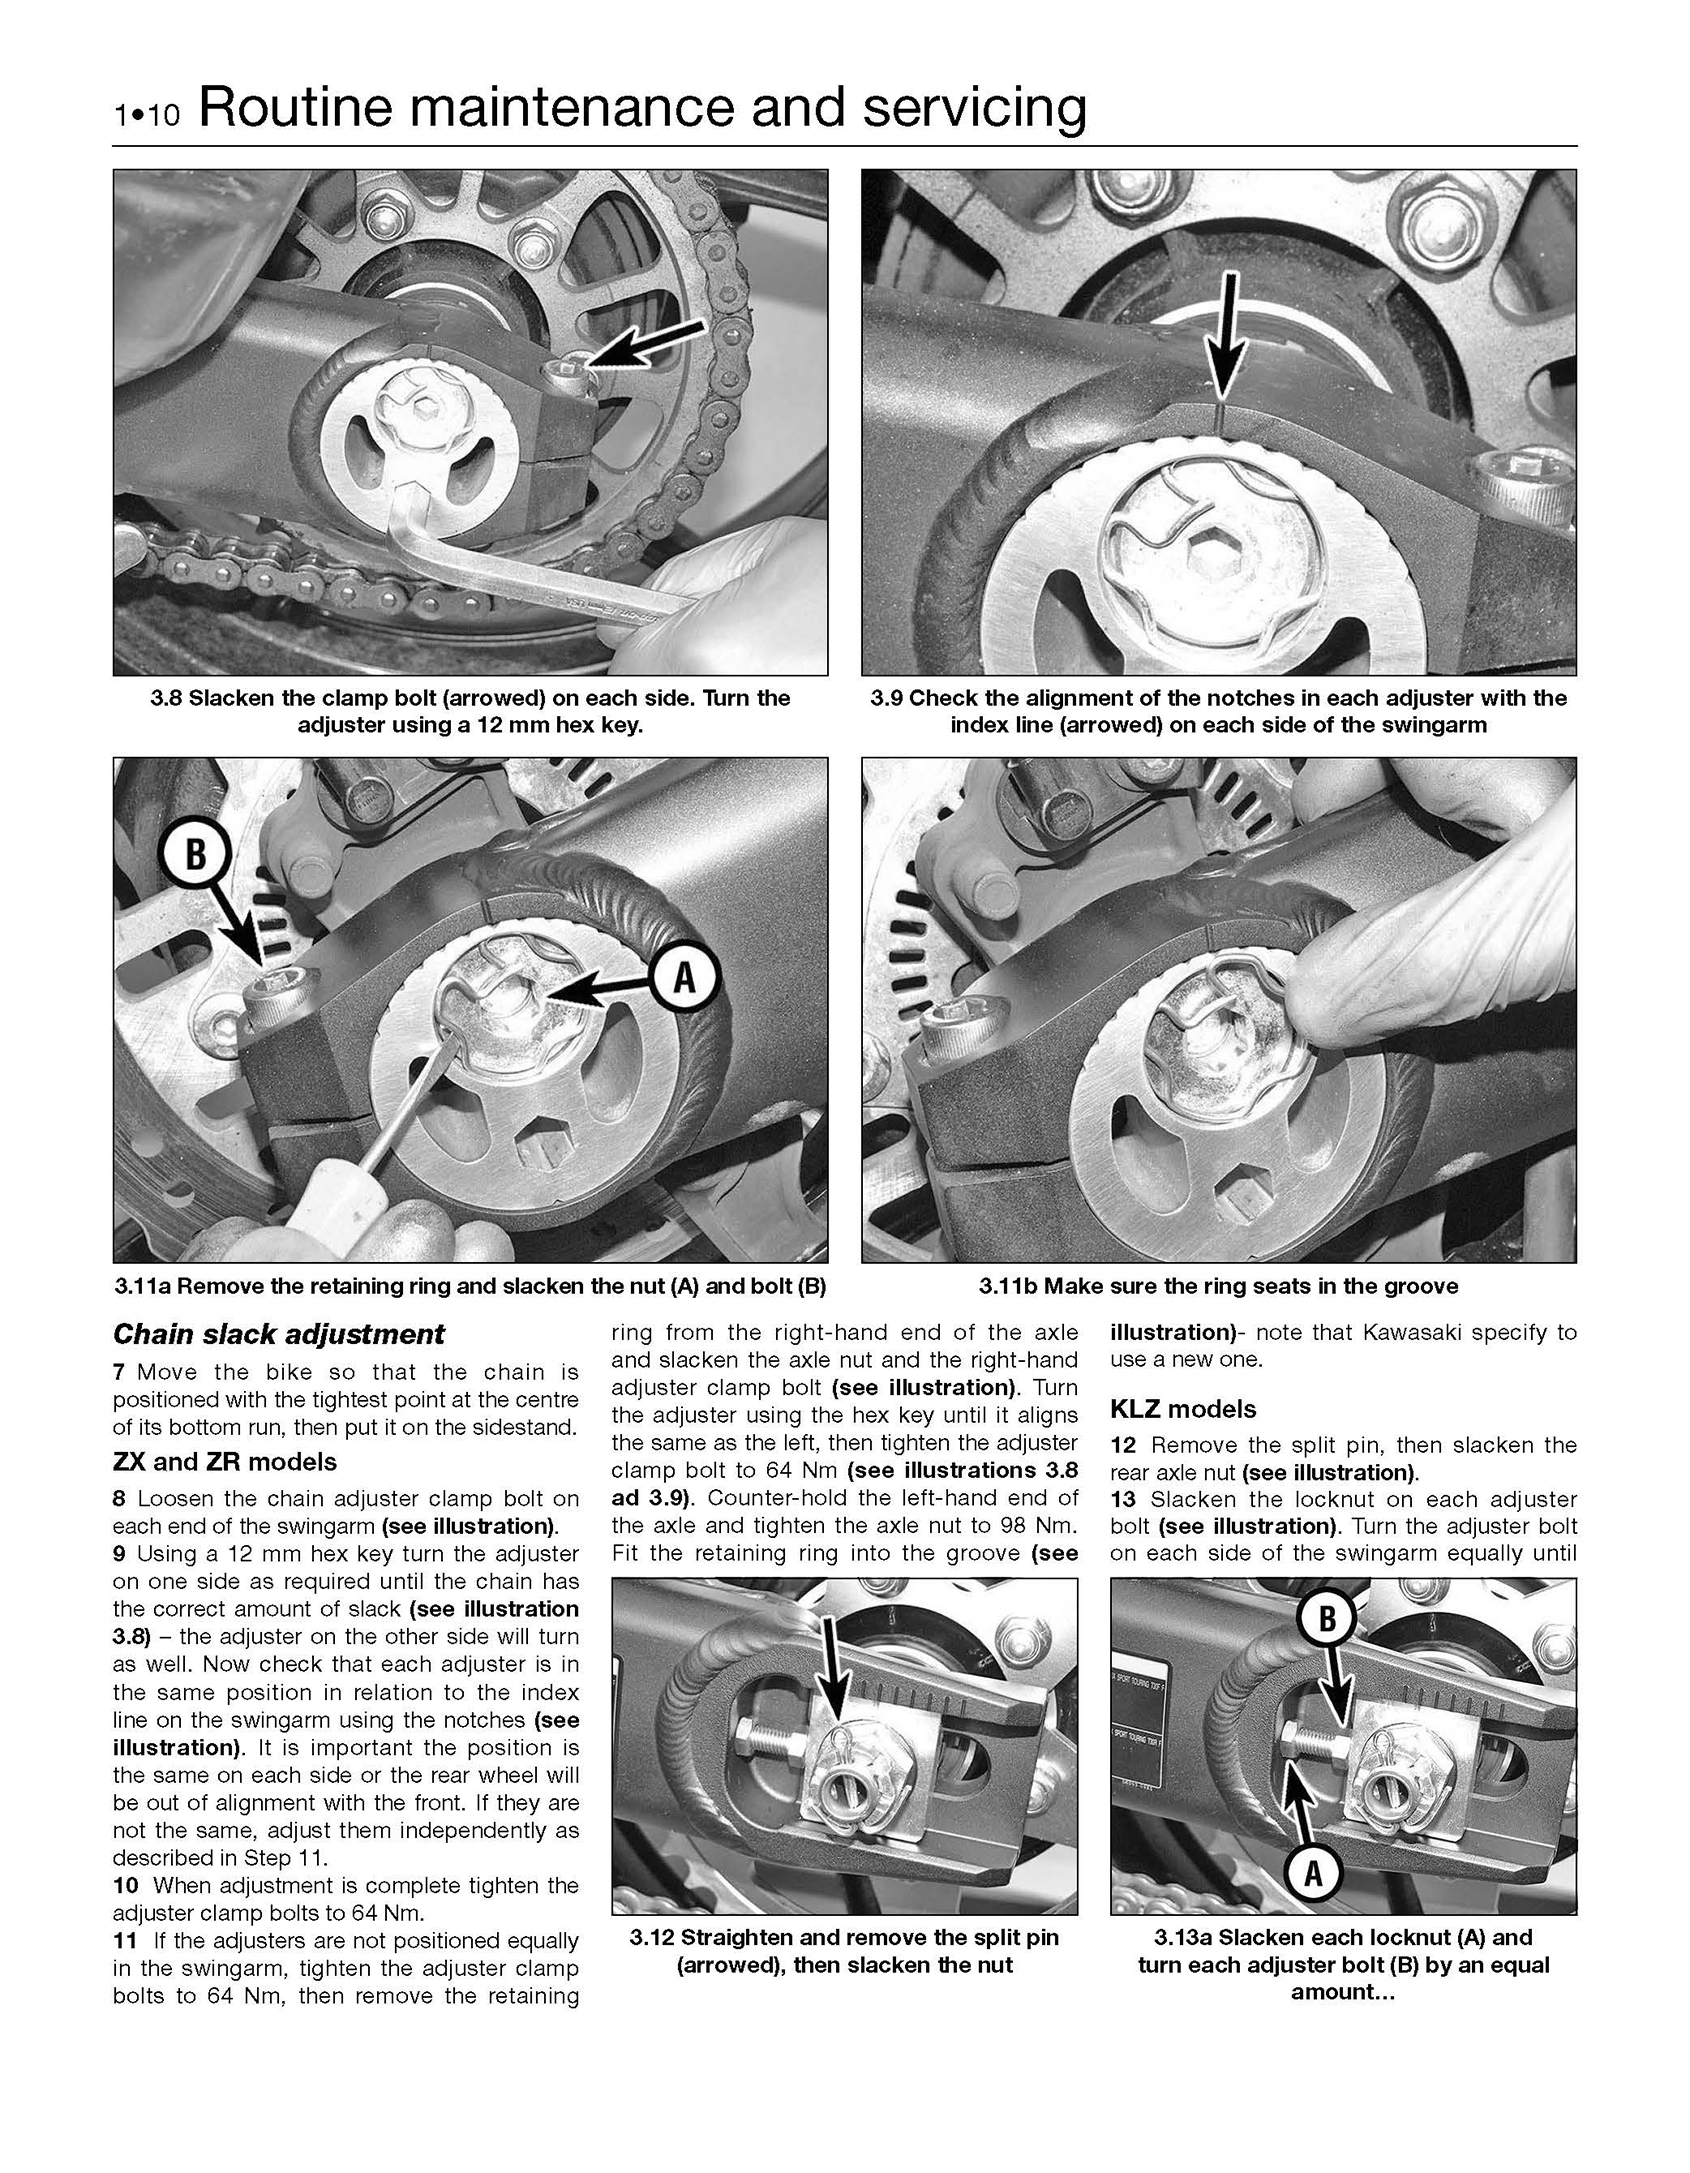 Z1000 Haynes Publishing 2006 Kawasaki Parts Diagram Wiring Schematic Scroll Right